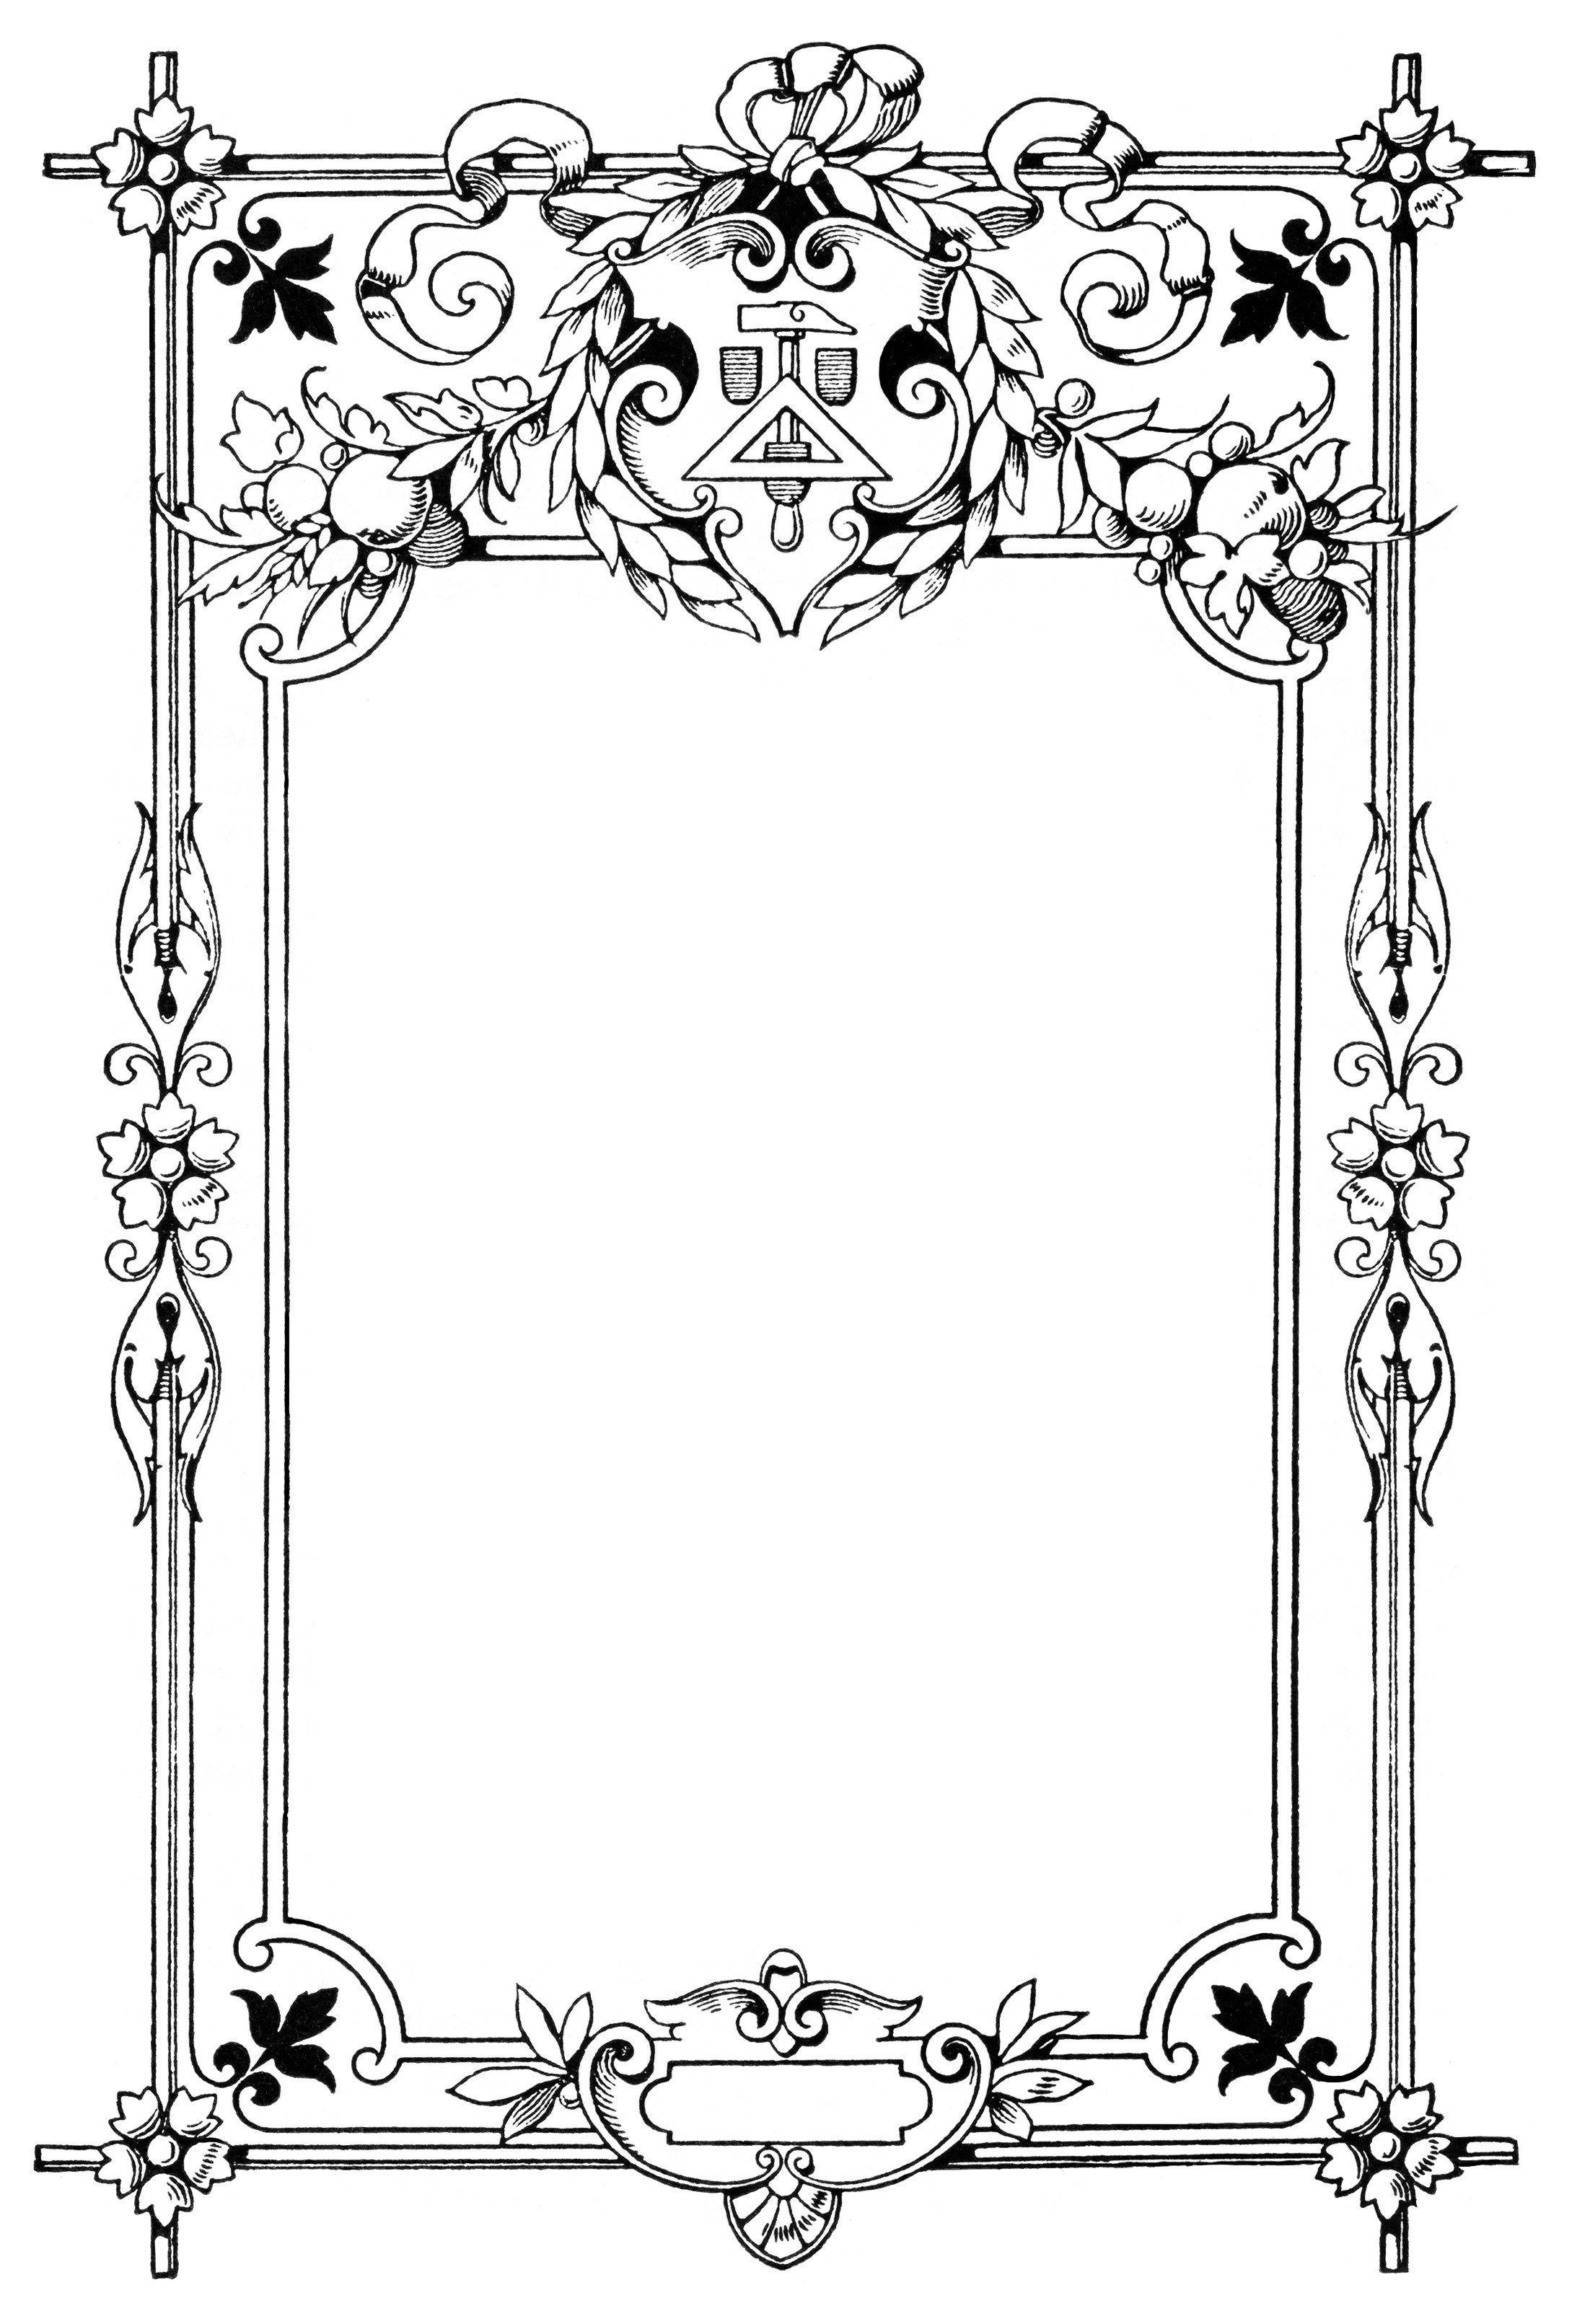 vintage frame clip art, swirly ornate illustration, black.